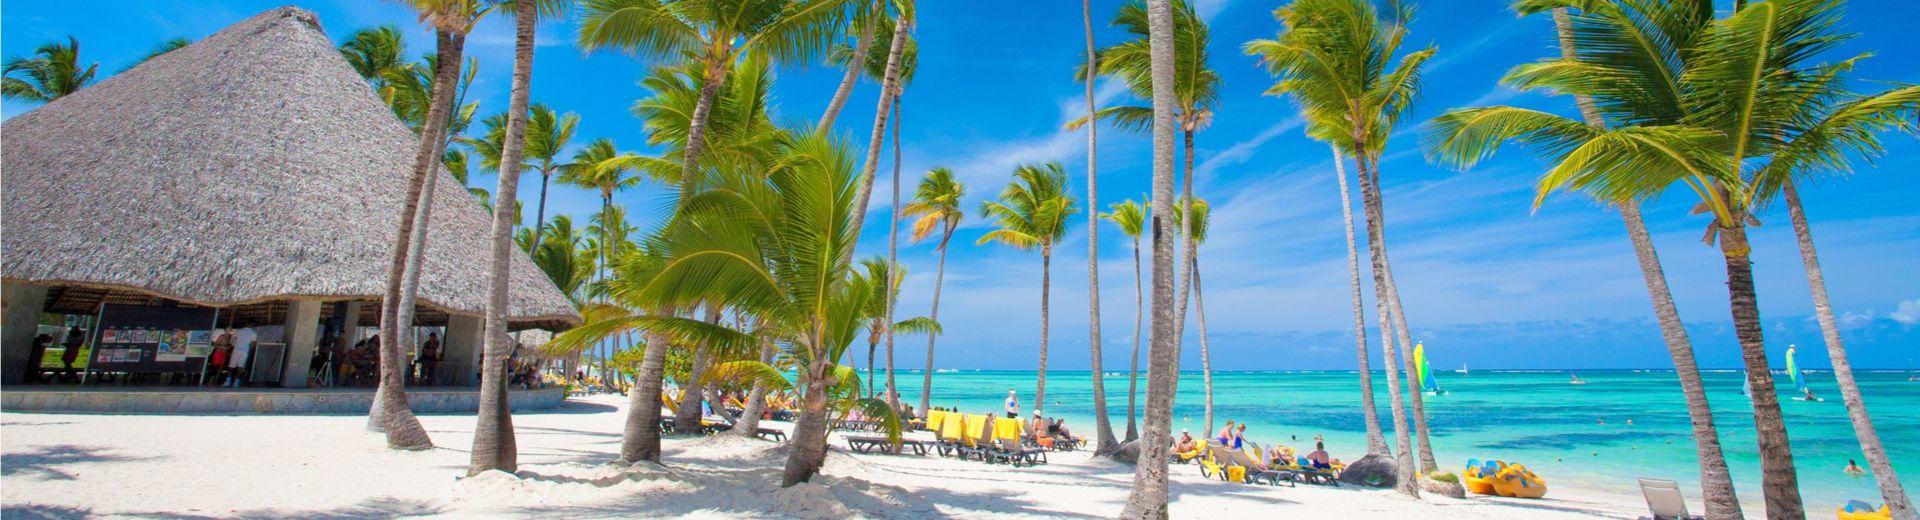 Dominikanische Republik im Winter ab 995 €